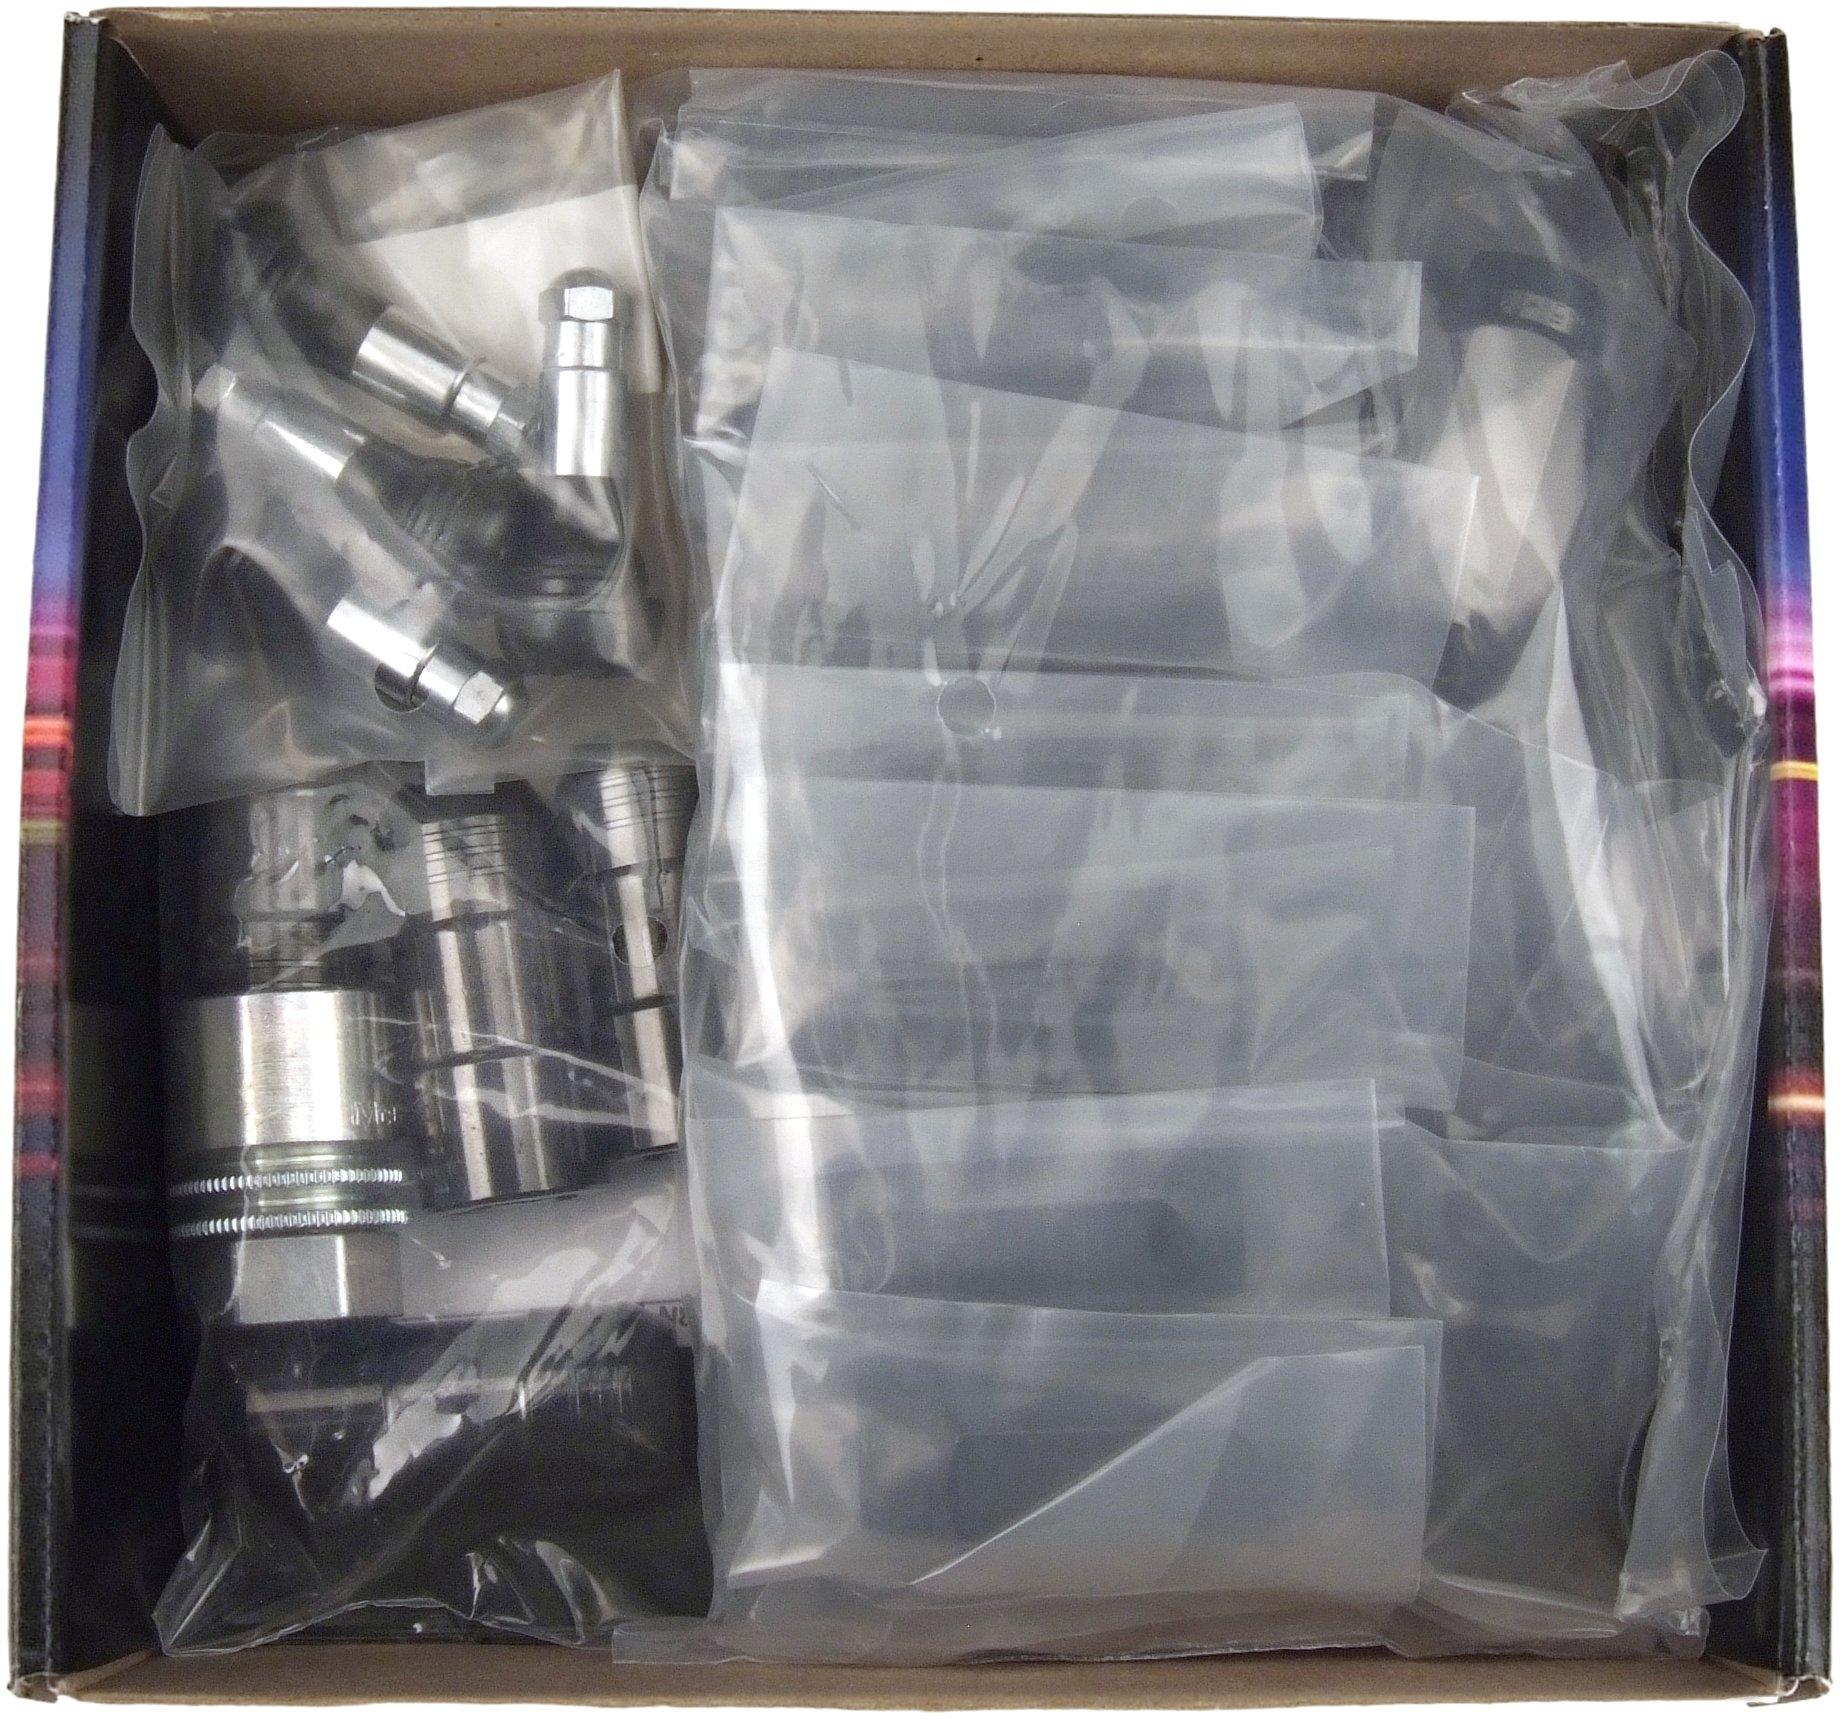 McGard 84640 Chrome/Black Cone Seat Wheel Installation Kit for 6 Lug Vehicles (M14 x 1.5 Thread Size)